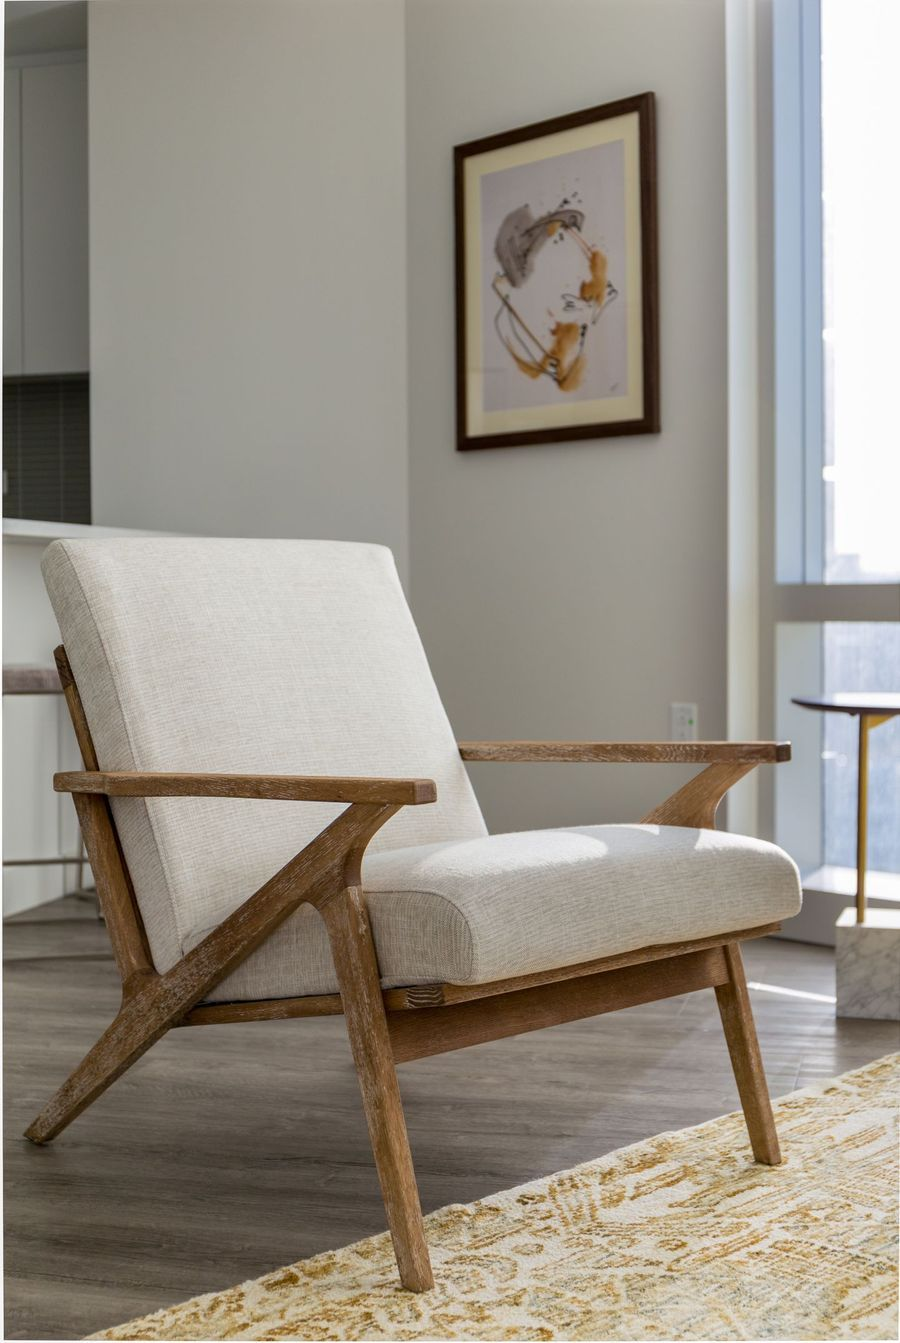 Adalyn Lounge Chair (Swan) – Edloe Finch Furniture Co.